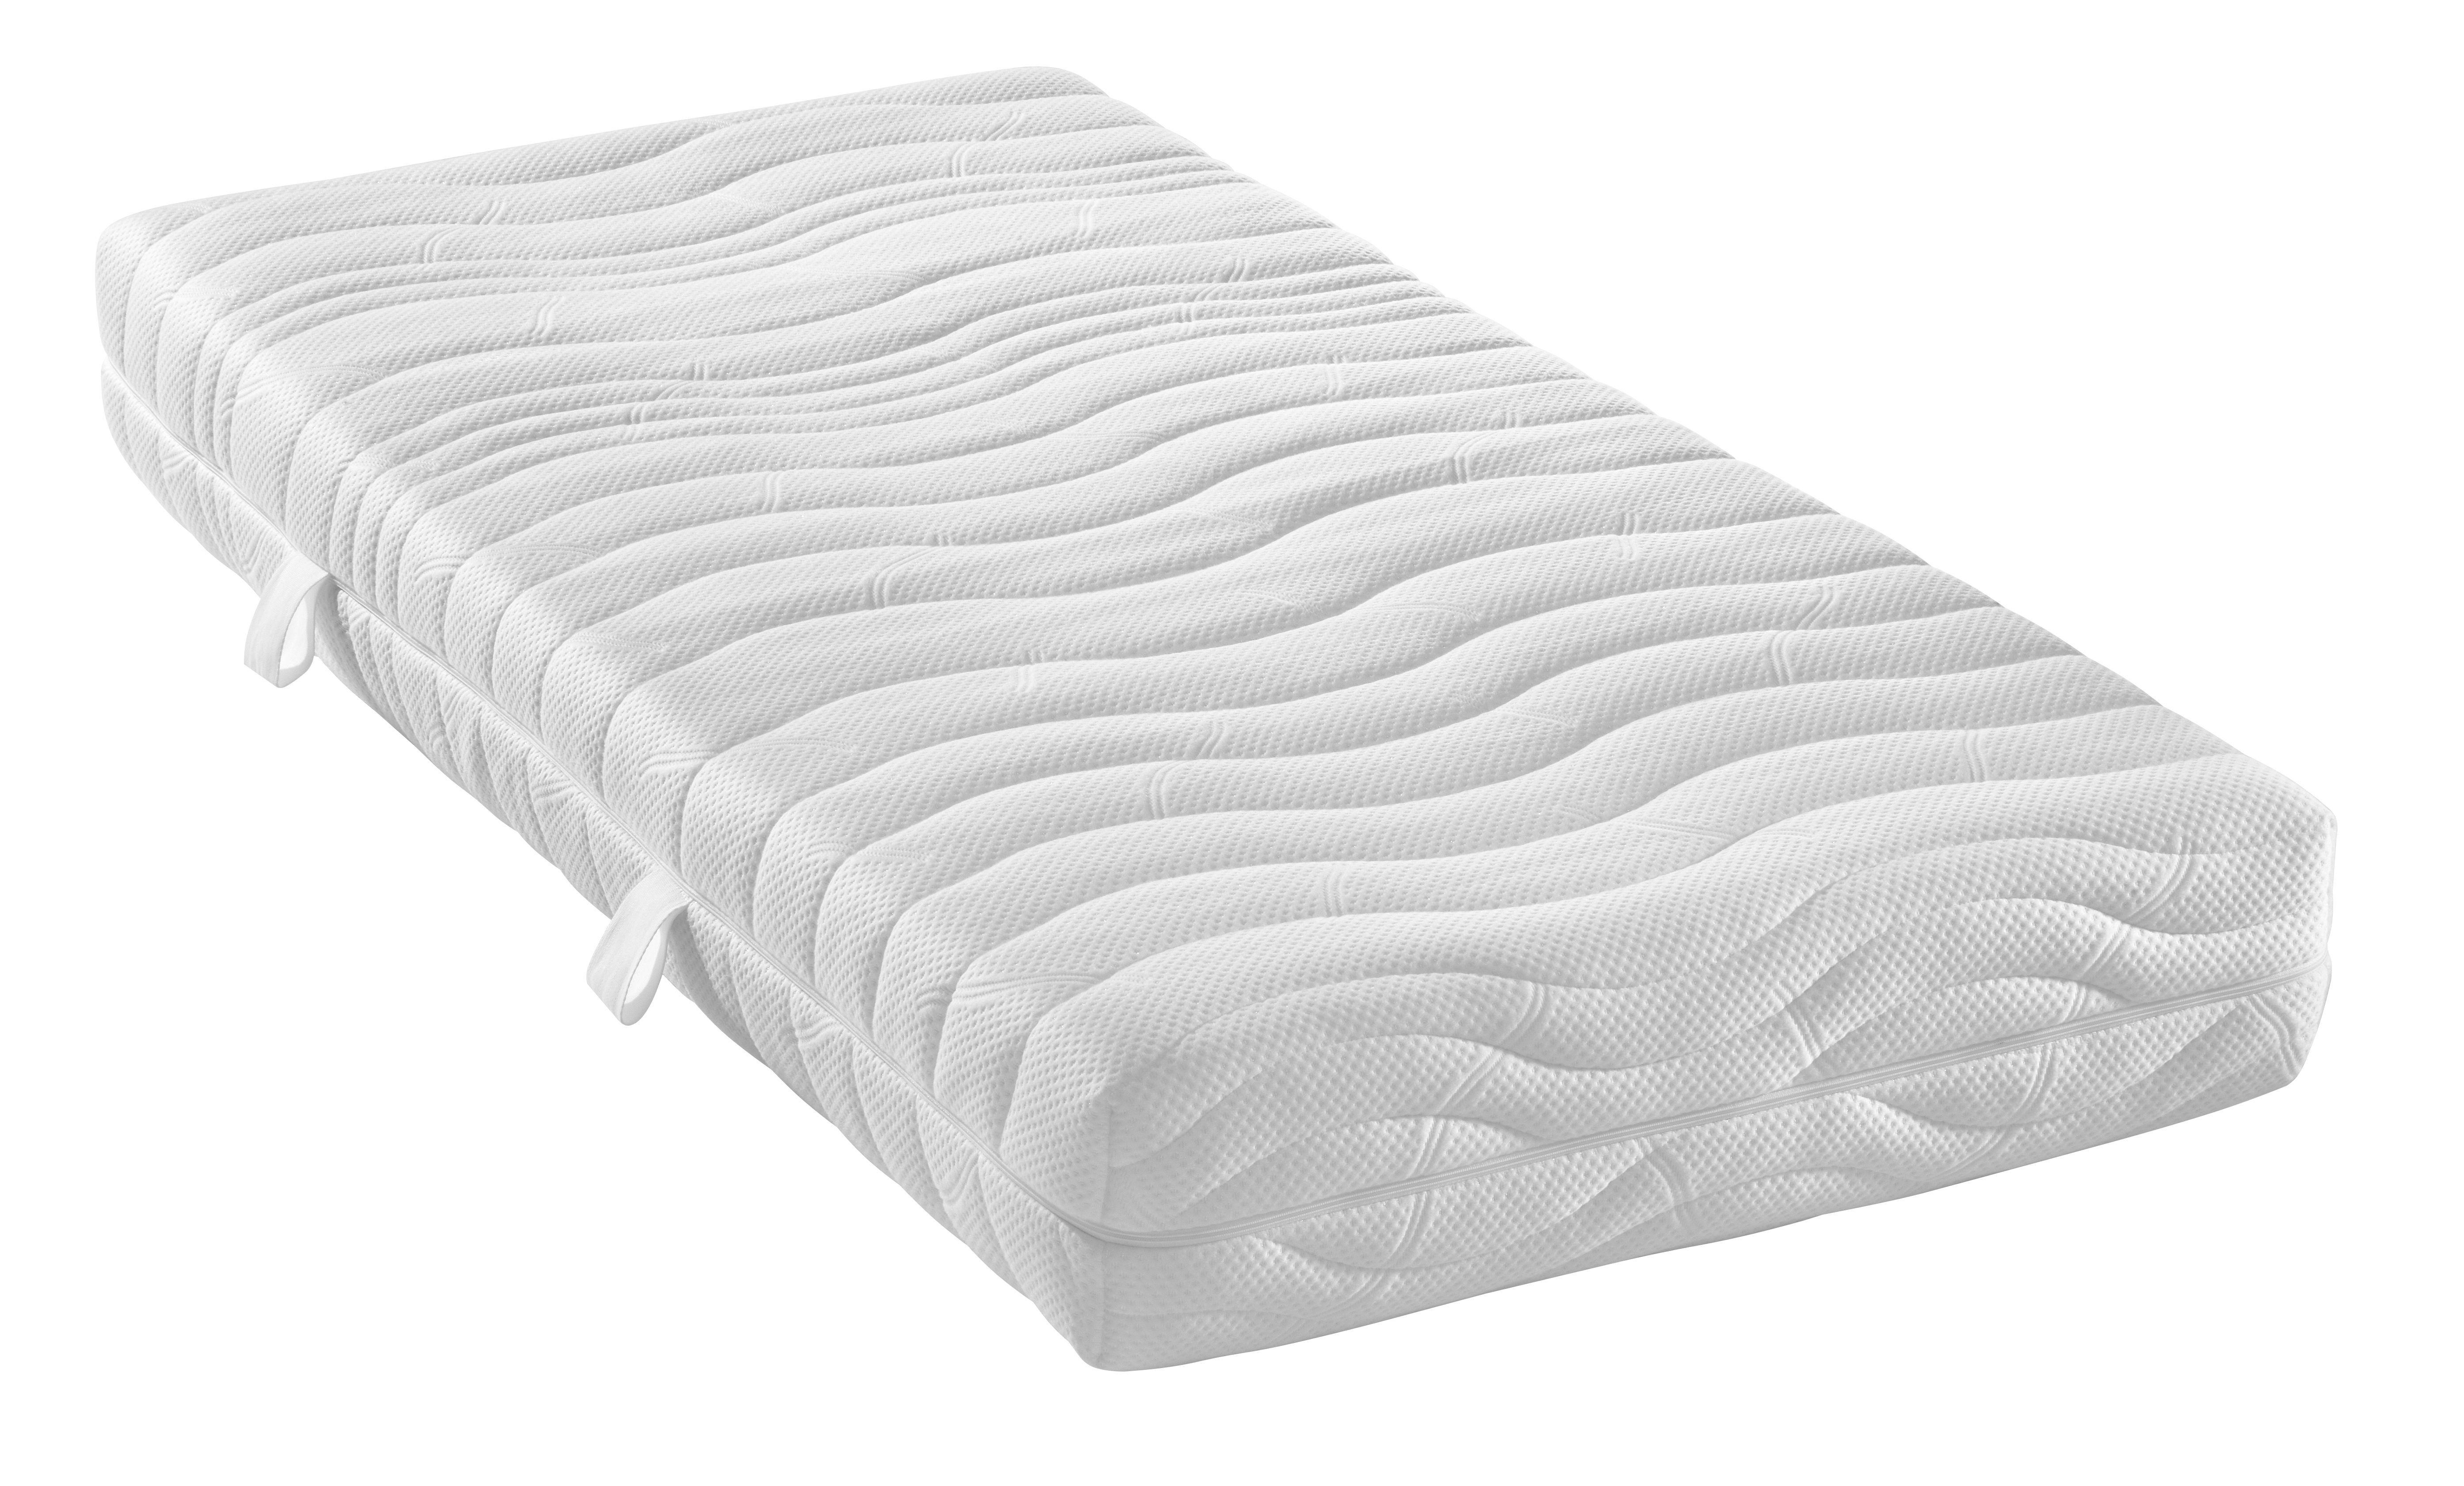 TASCHENFEDERKERNMATRATZE 90/200 cm - Weiß, Basics, Textil (90/200cm) - DIAMONA